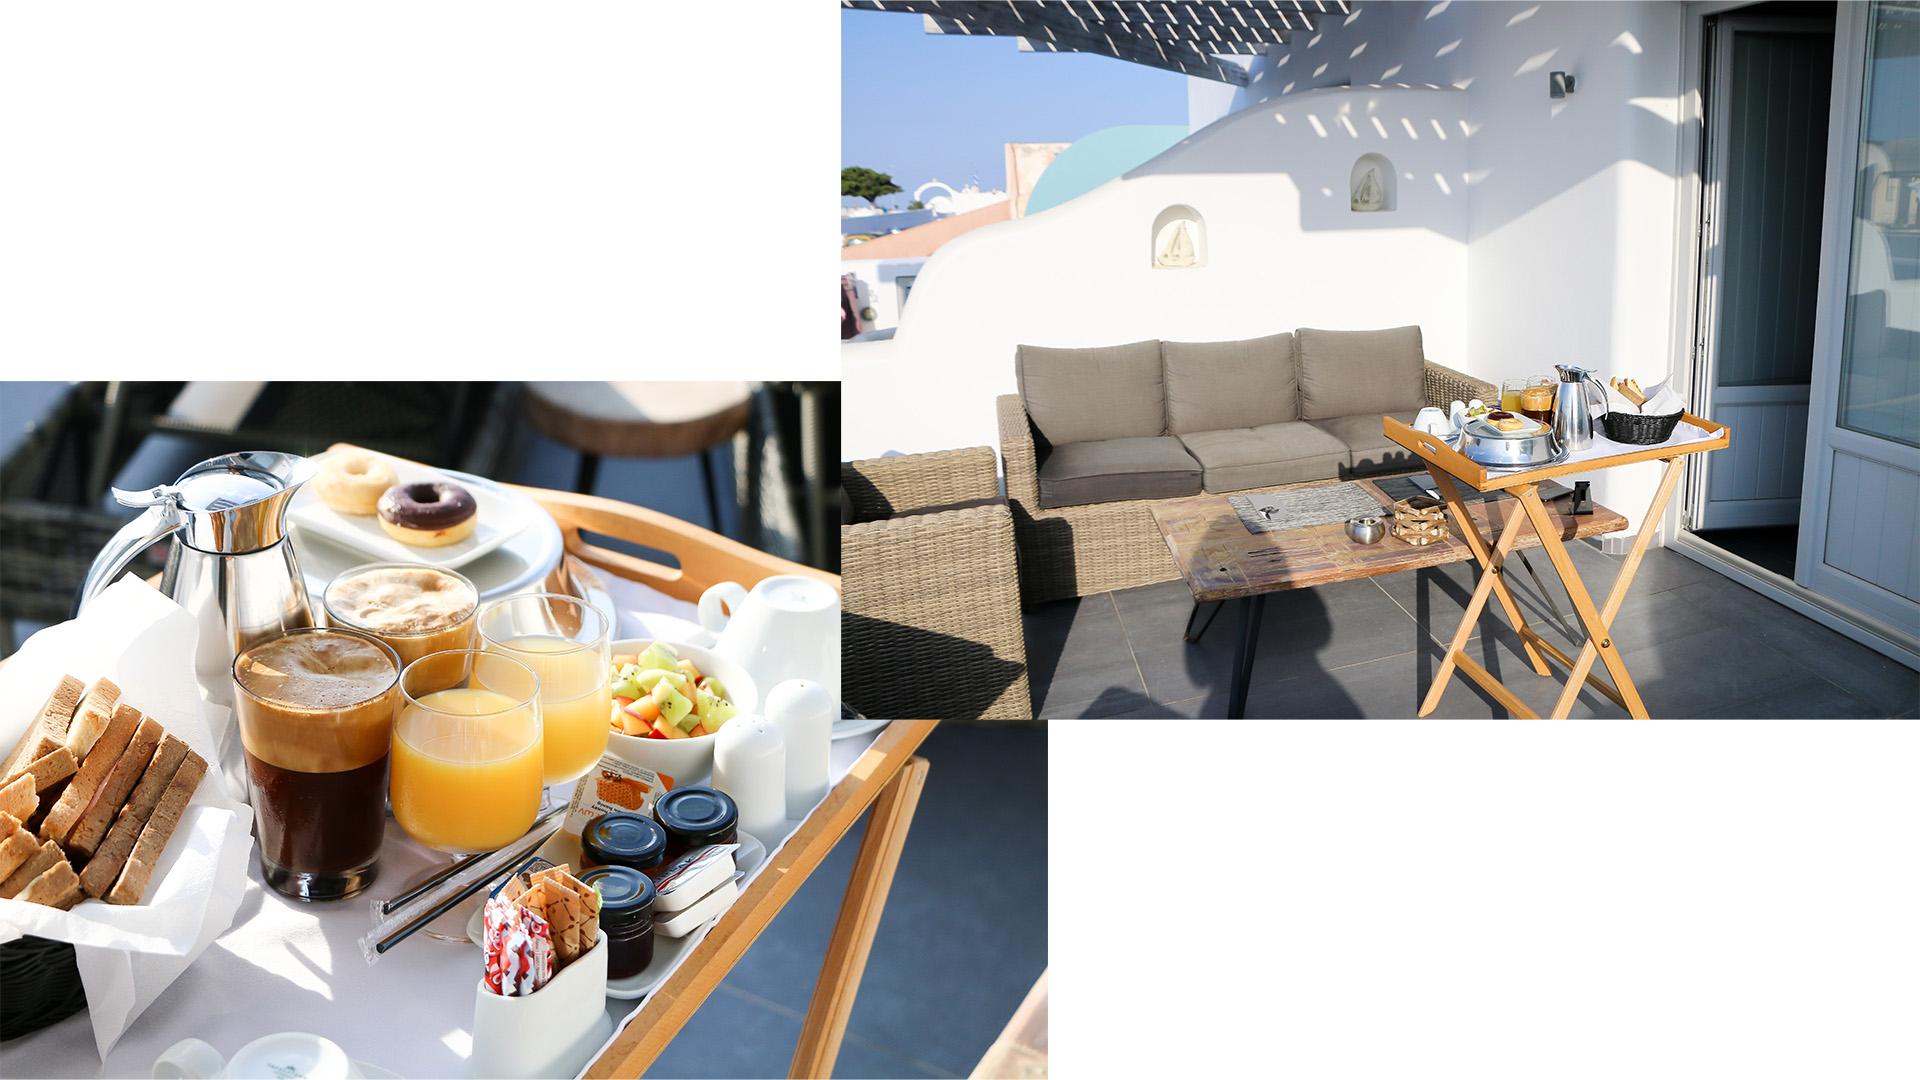 hotel-oia-elitoz-suite-santorin-avis-luxe-voyage-grèce-petit-déjeuner